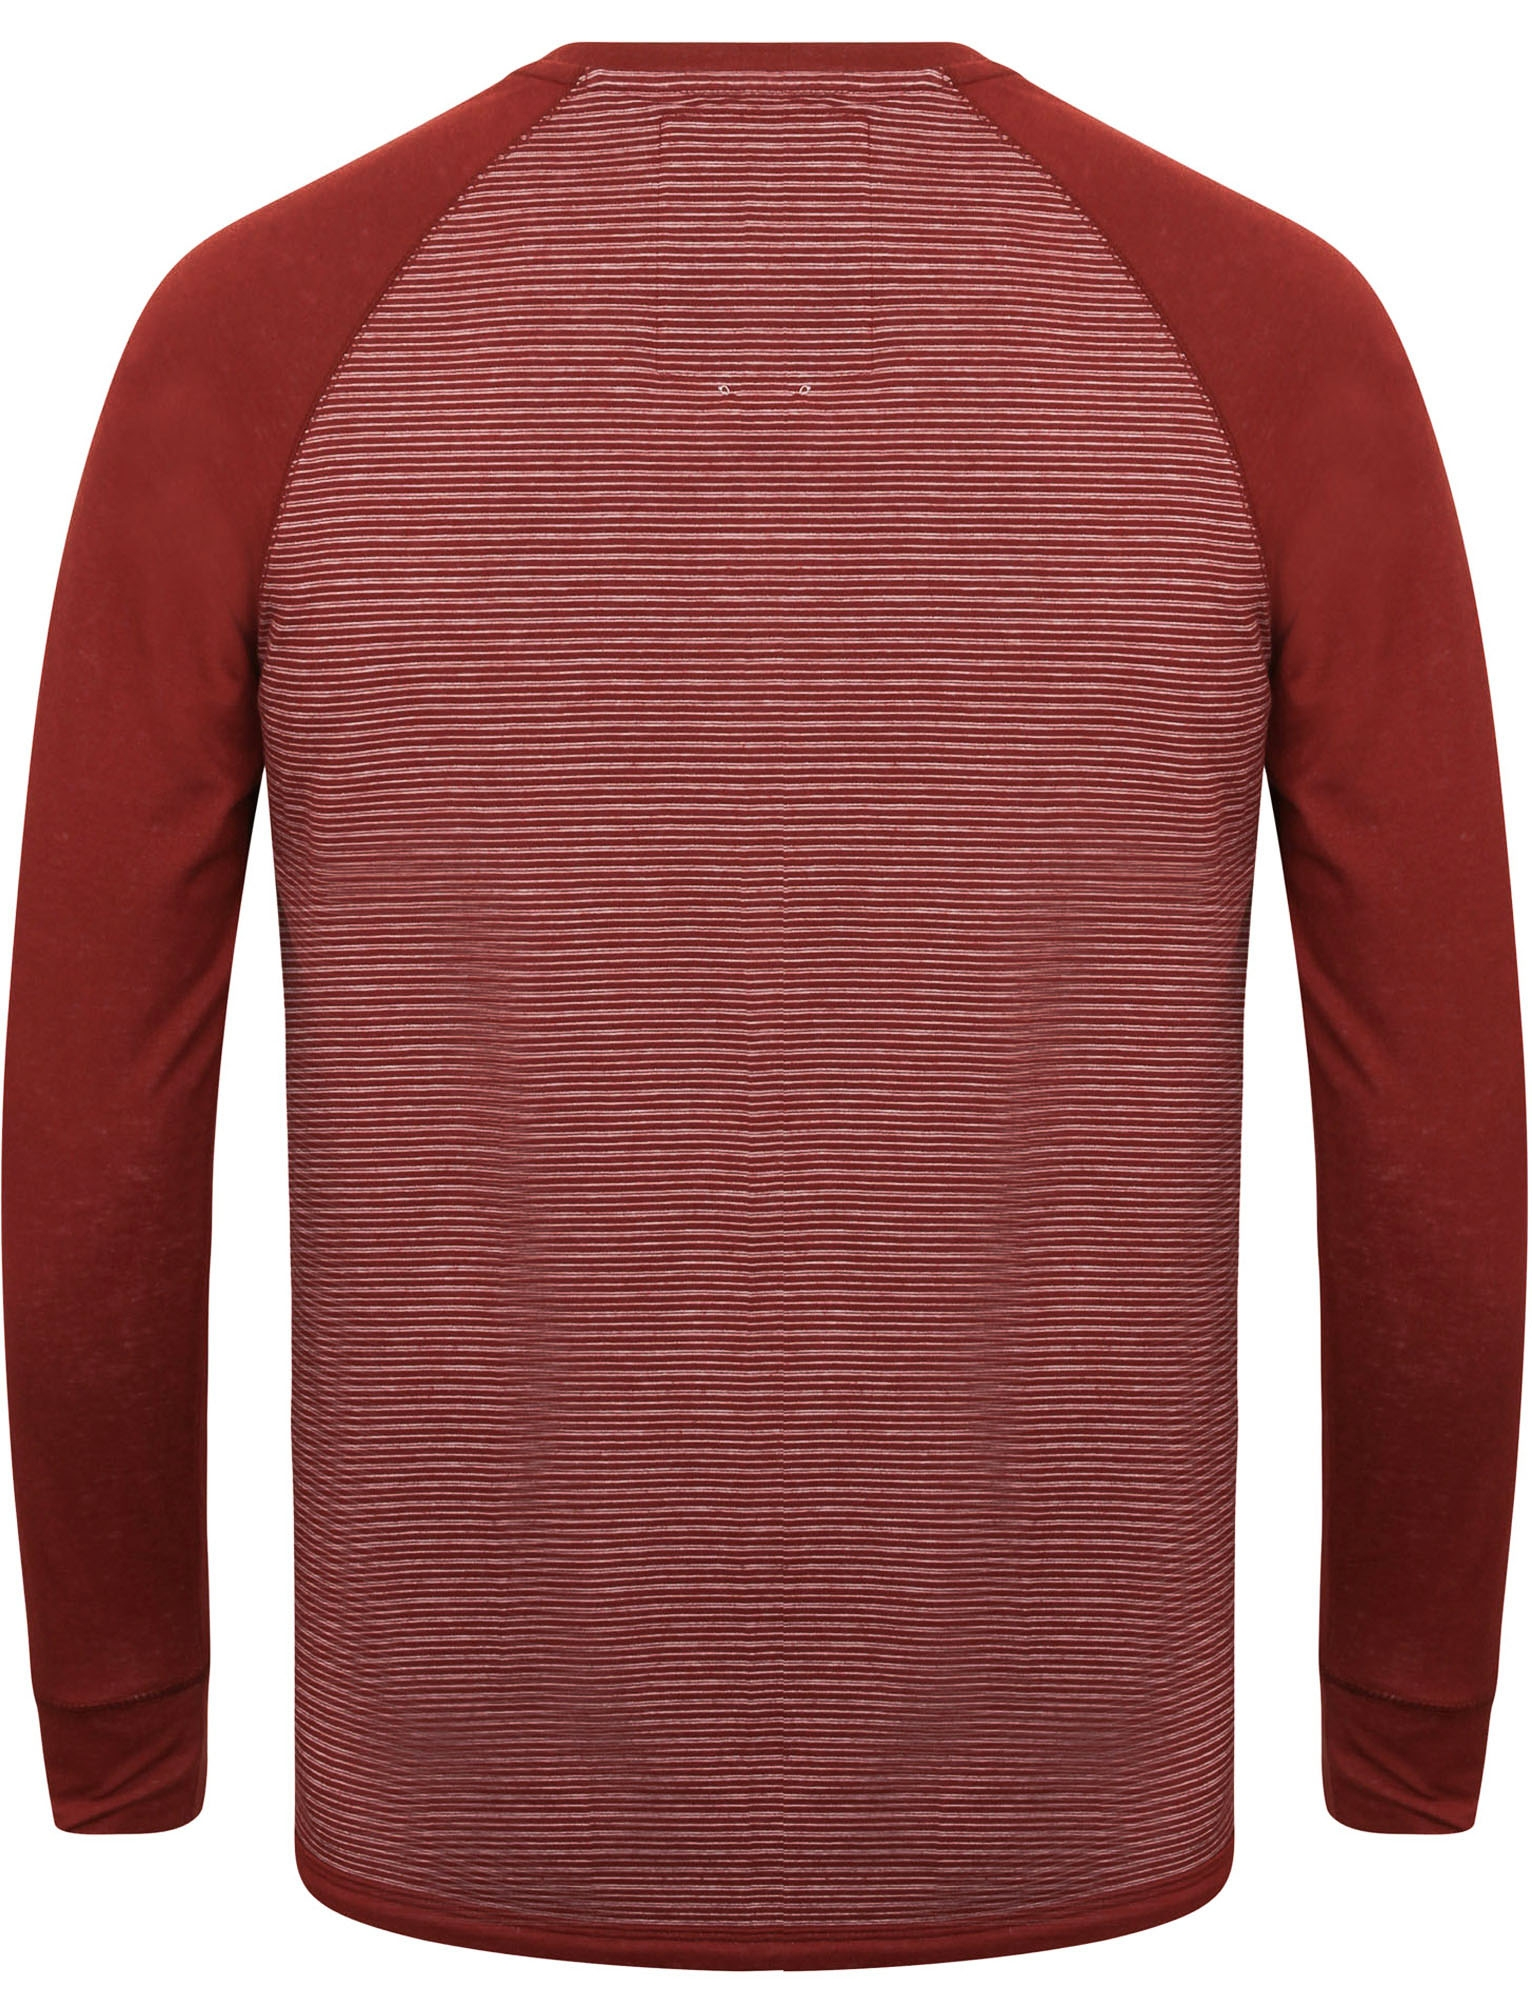 New-Mens-Tokyo-Laundry-Sephro-Raglan-Long-Sleeve-Henley-T-shirt-Top-Size-S-XL thumbnail 3